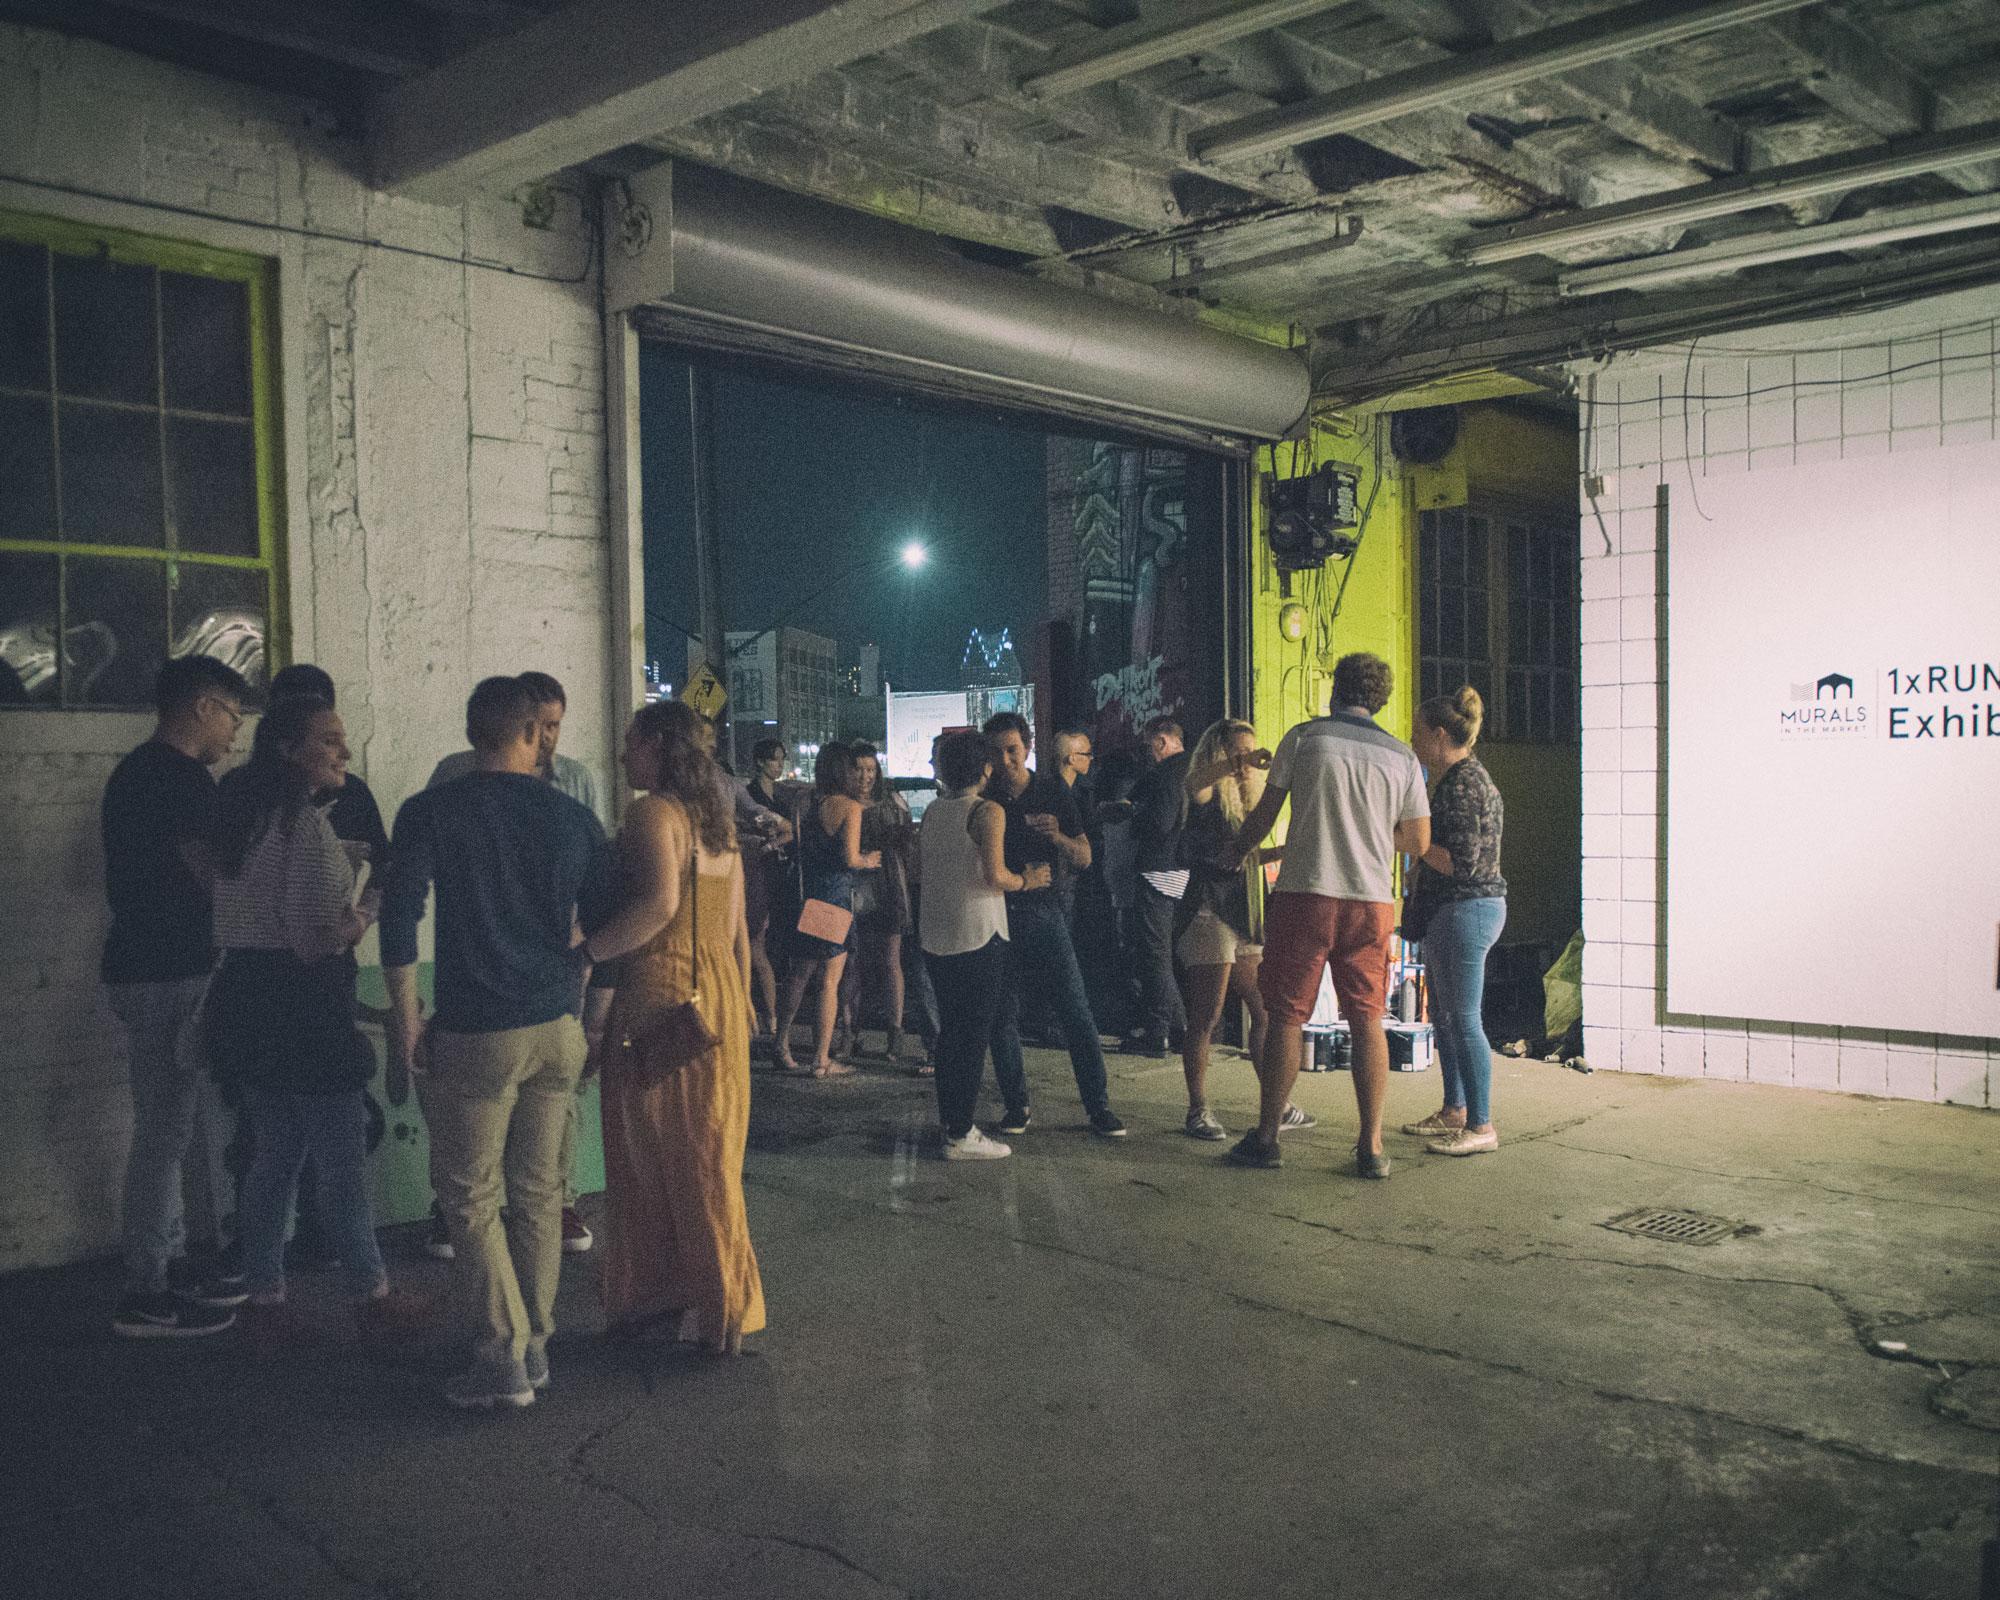 Print-Exhibition-Opening-1xRun-MITM-NicoleStJohn_00008.jpg